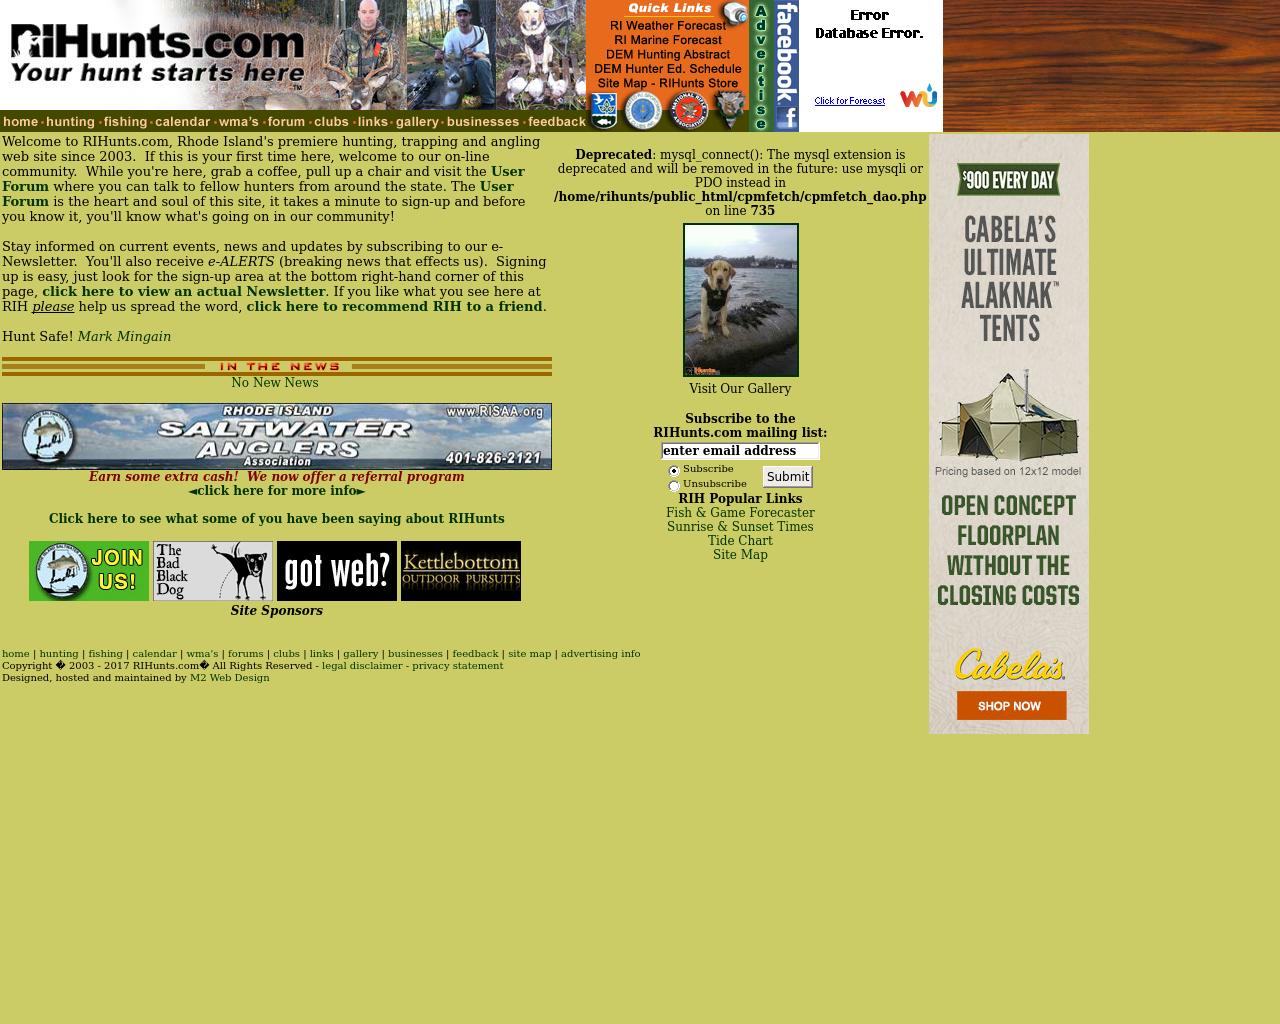 RiHunts-Advertising-Reviews-Pricing